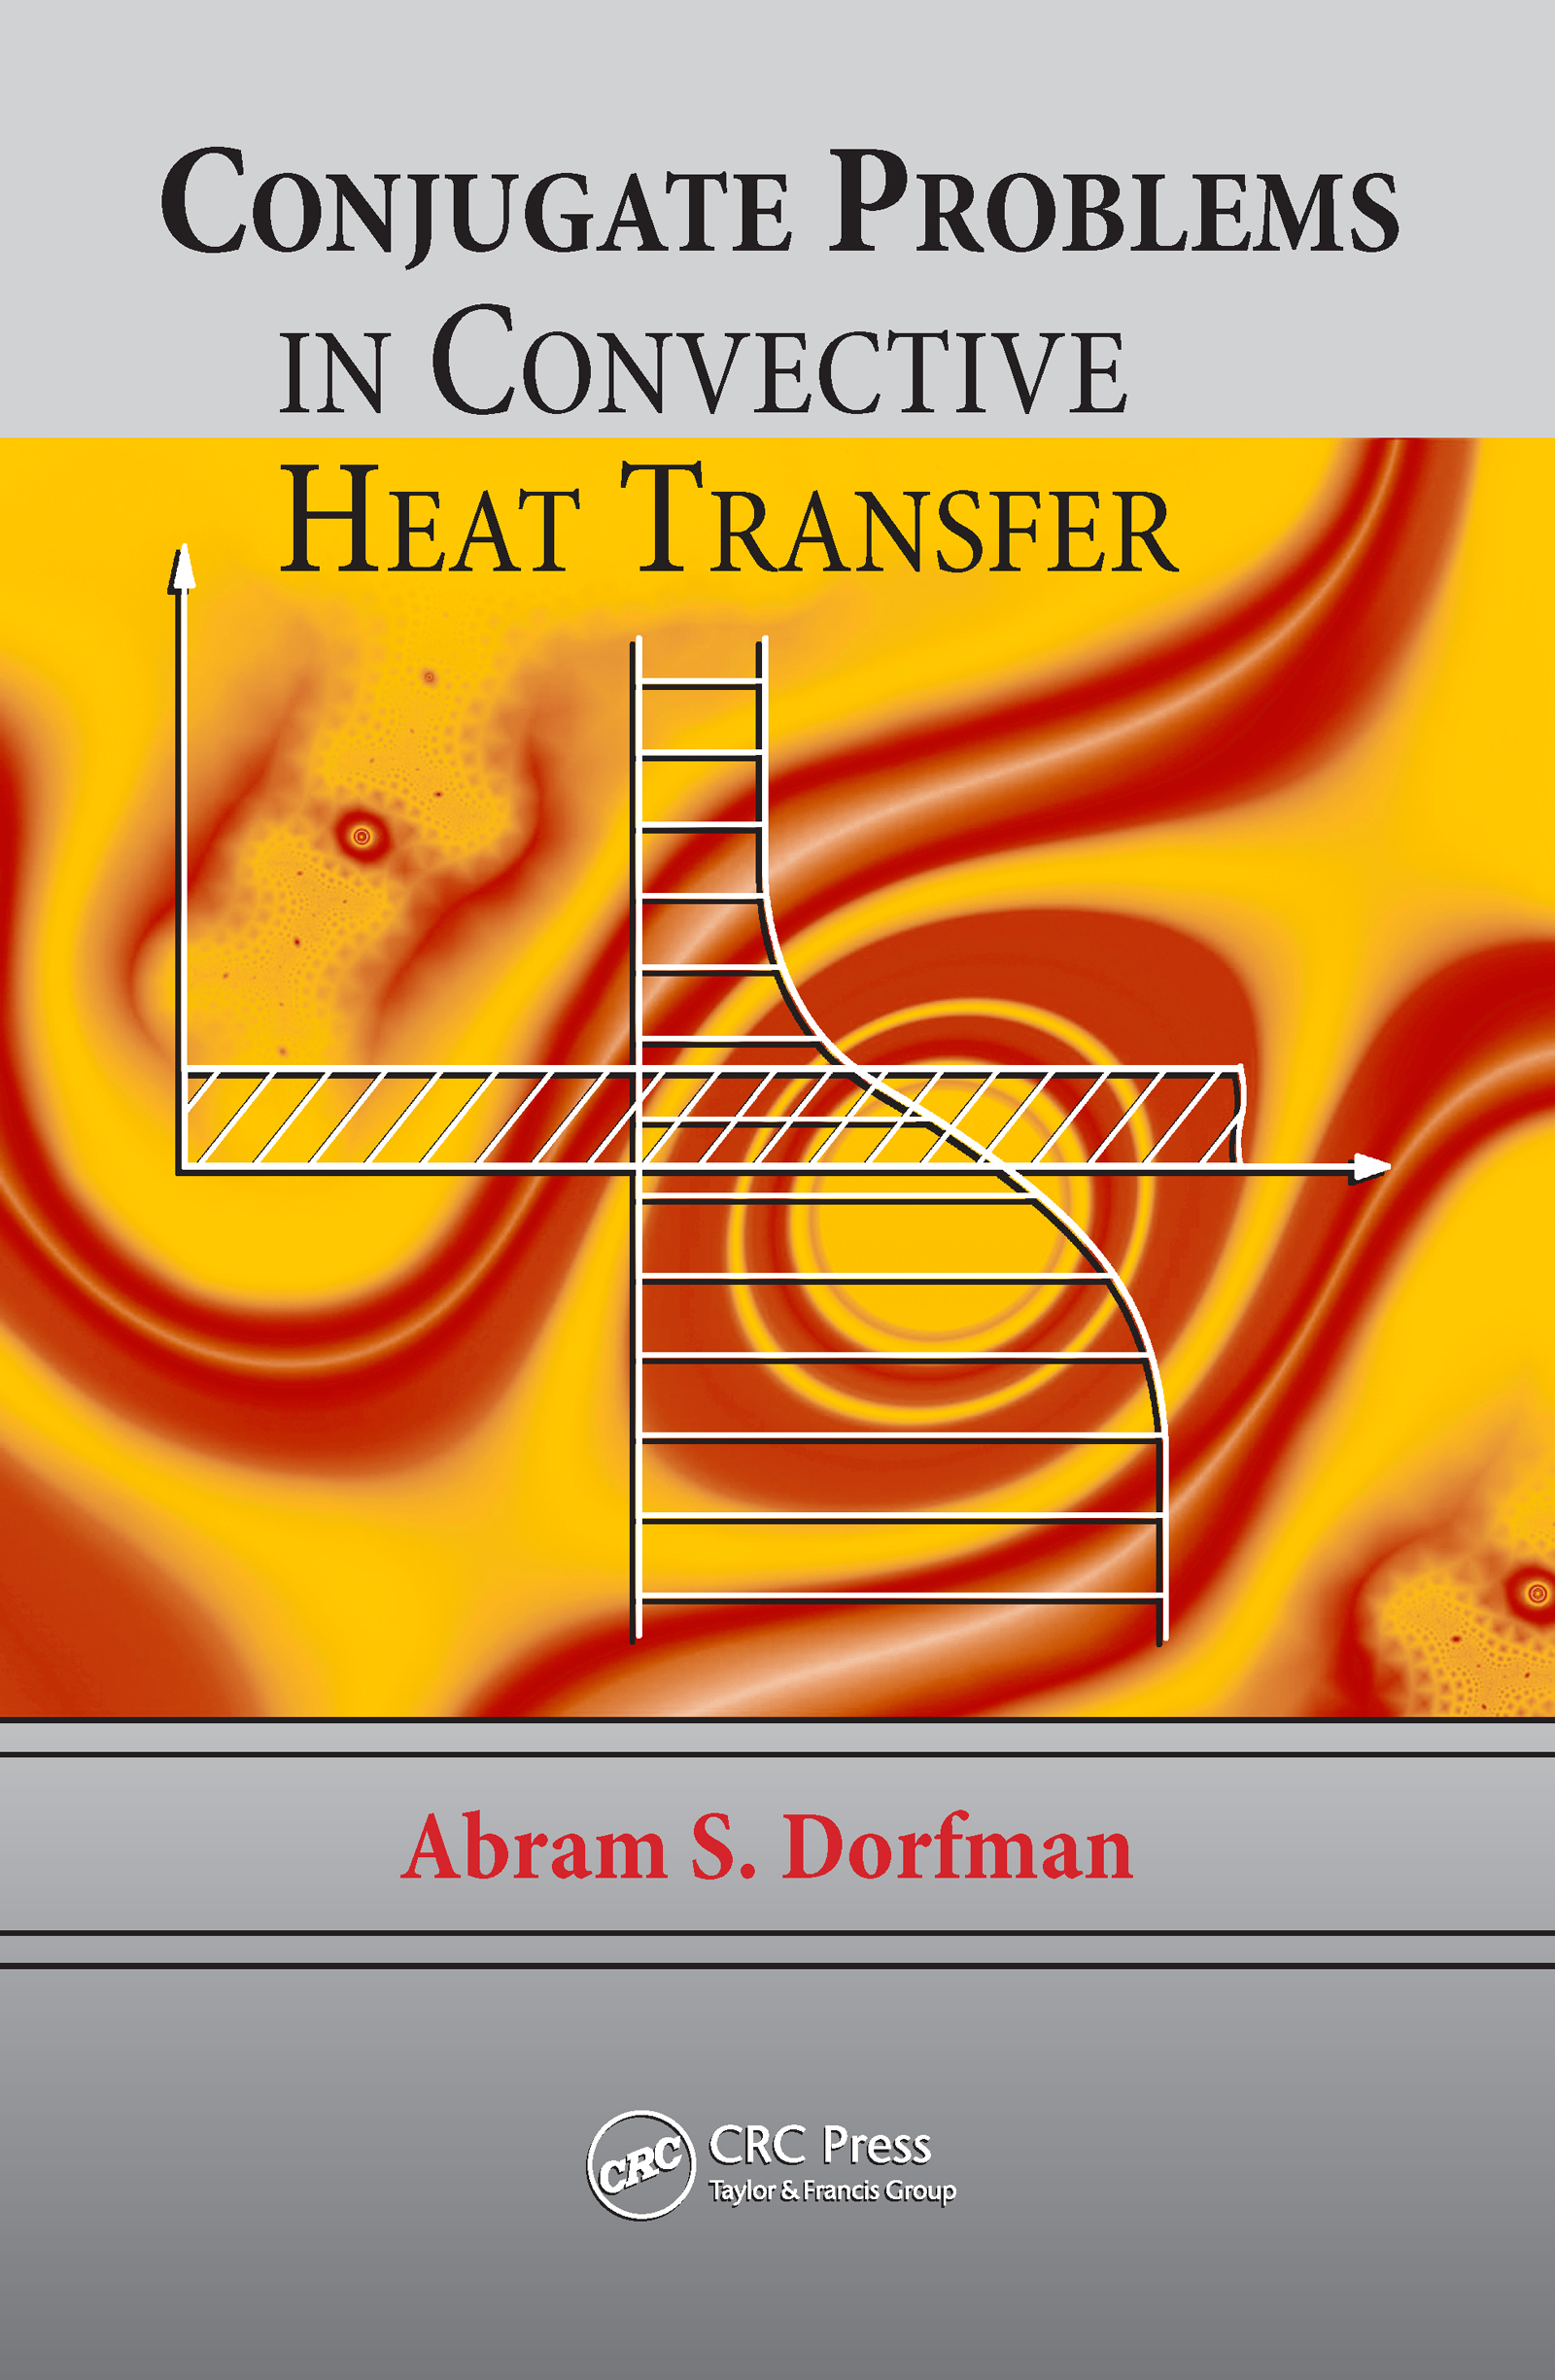 Conjugate Problems in Convective Heat Transfer book cover